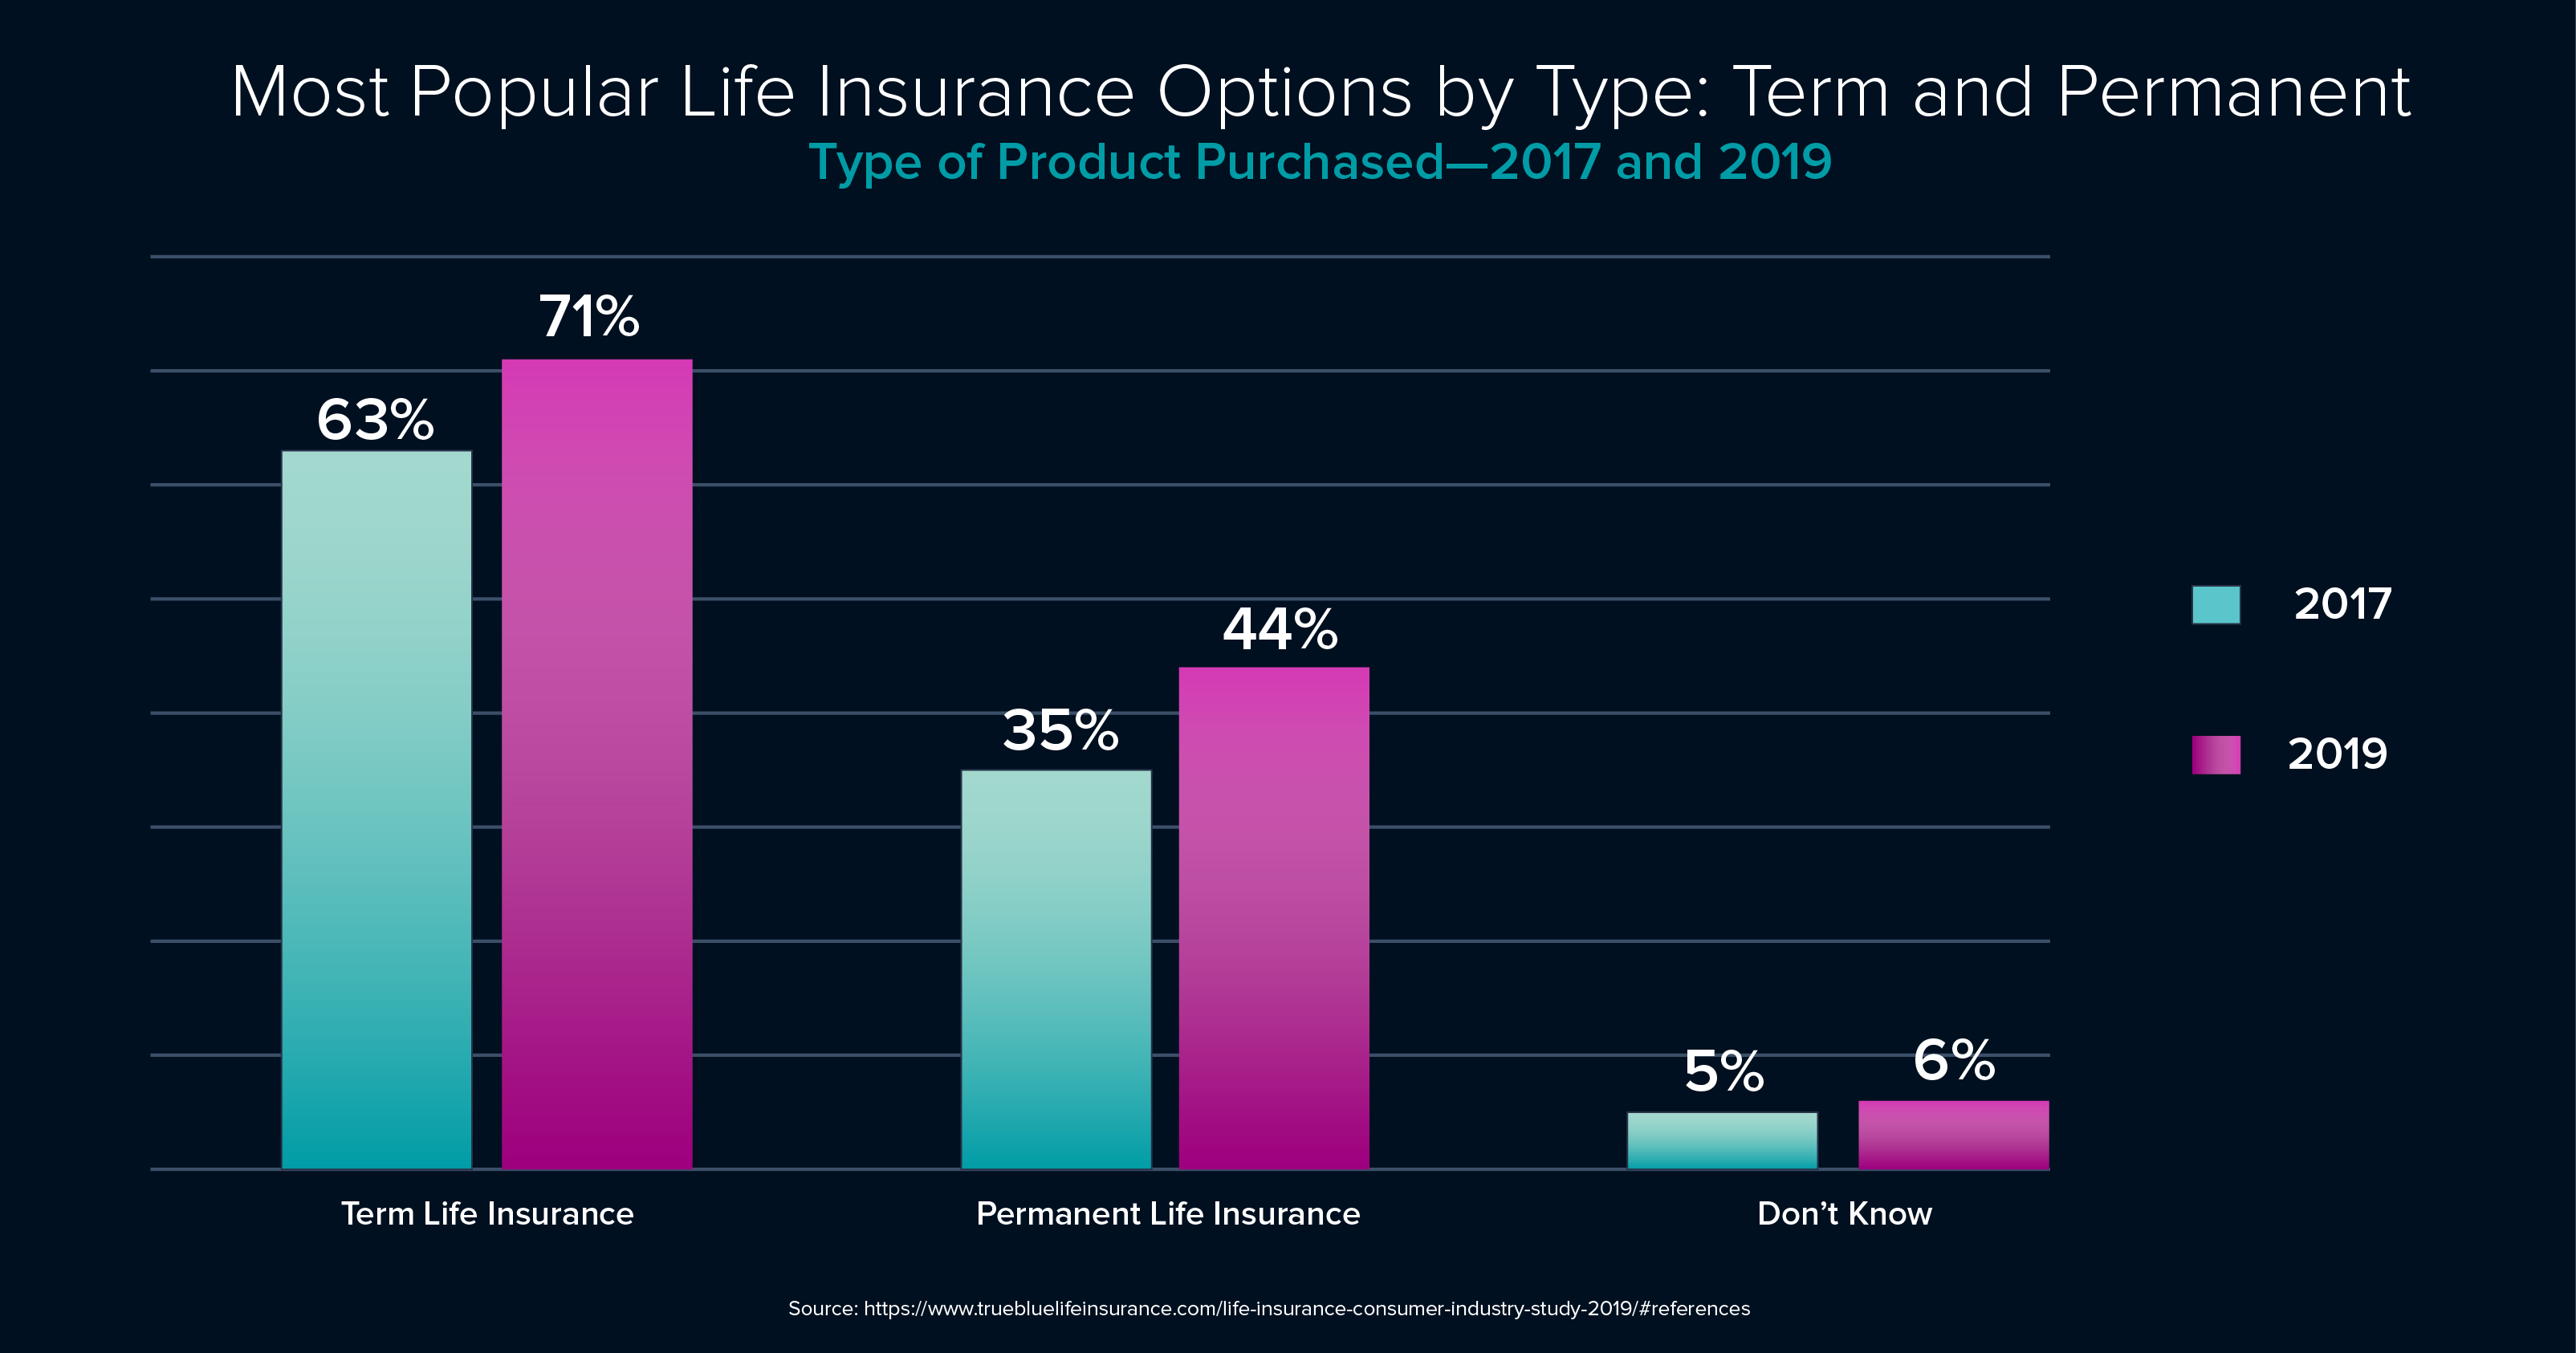 Surprising_Life_Insurance_MOST_POPULAR_LIFE_INSURANCE_OPTIONS